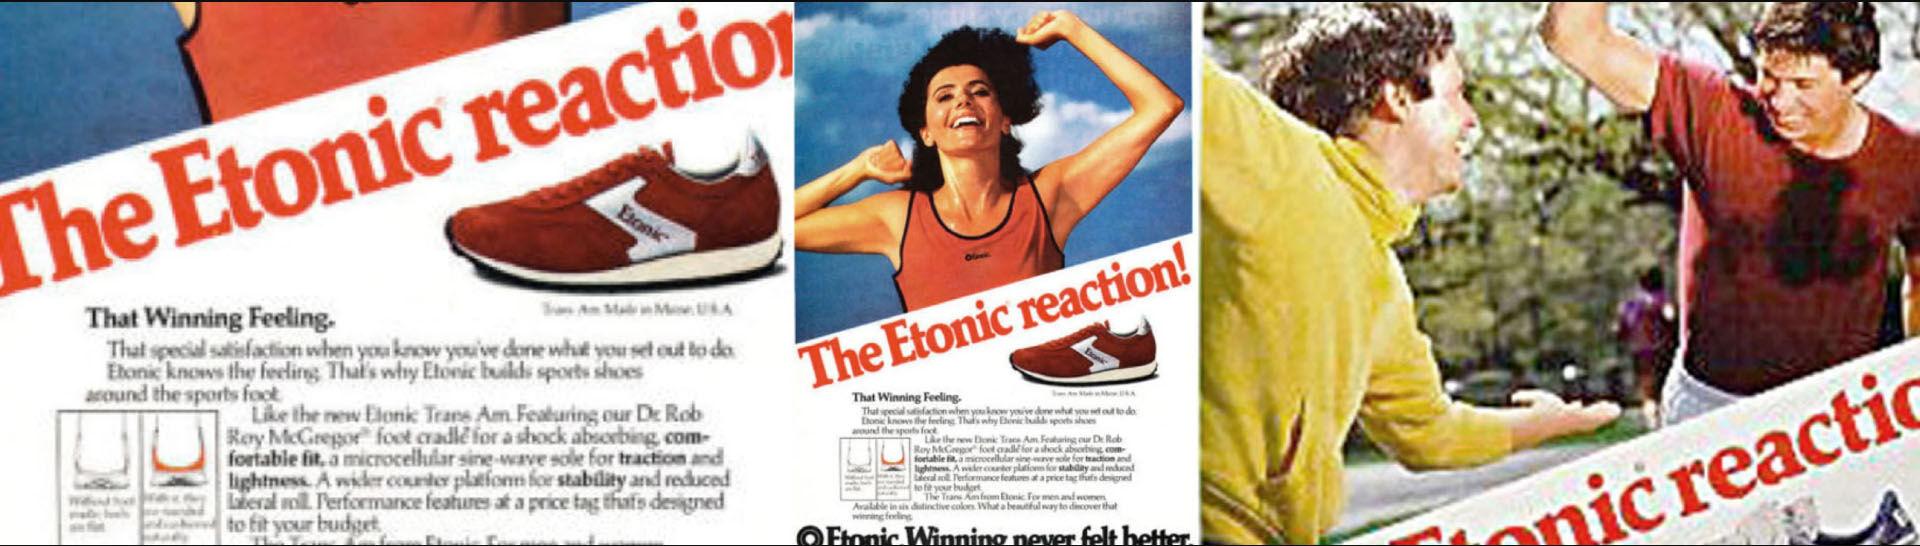 sebastiano-etonic-ujmarka-sneakers